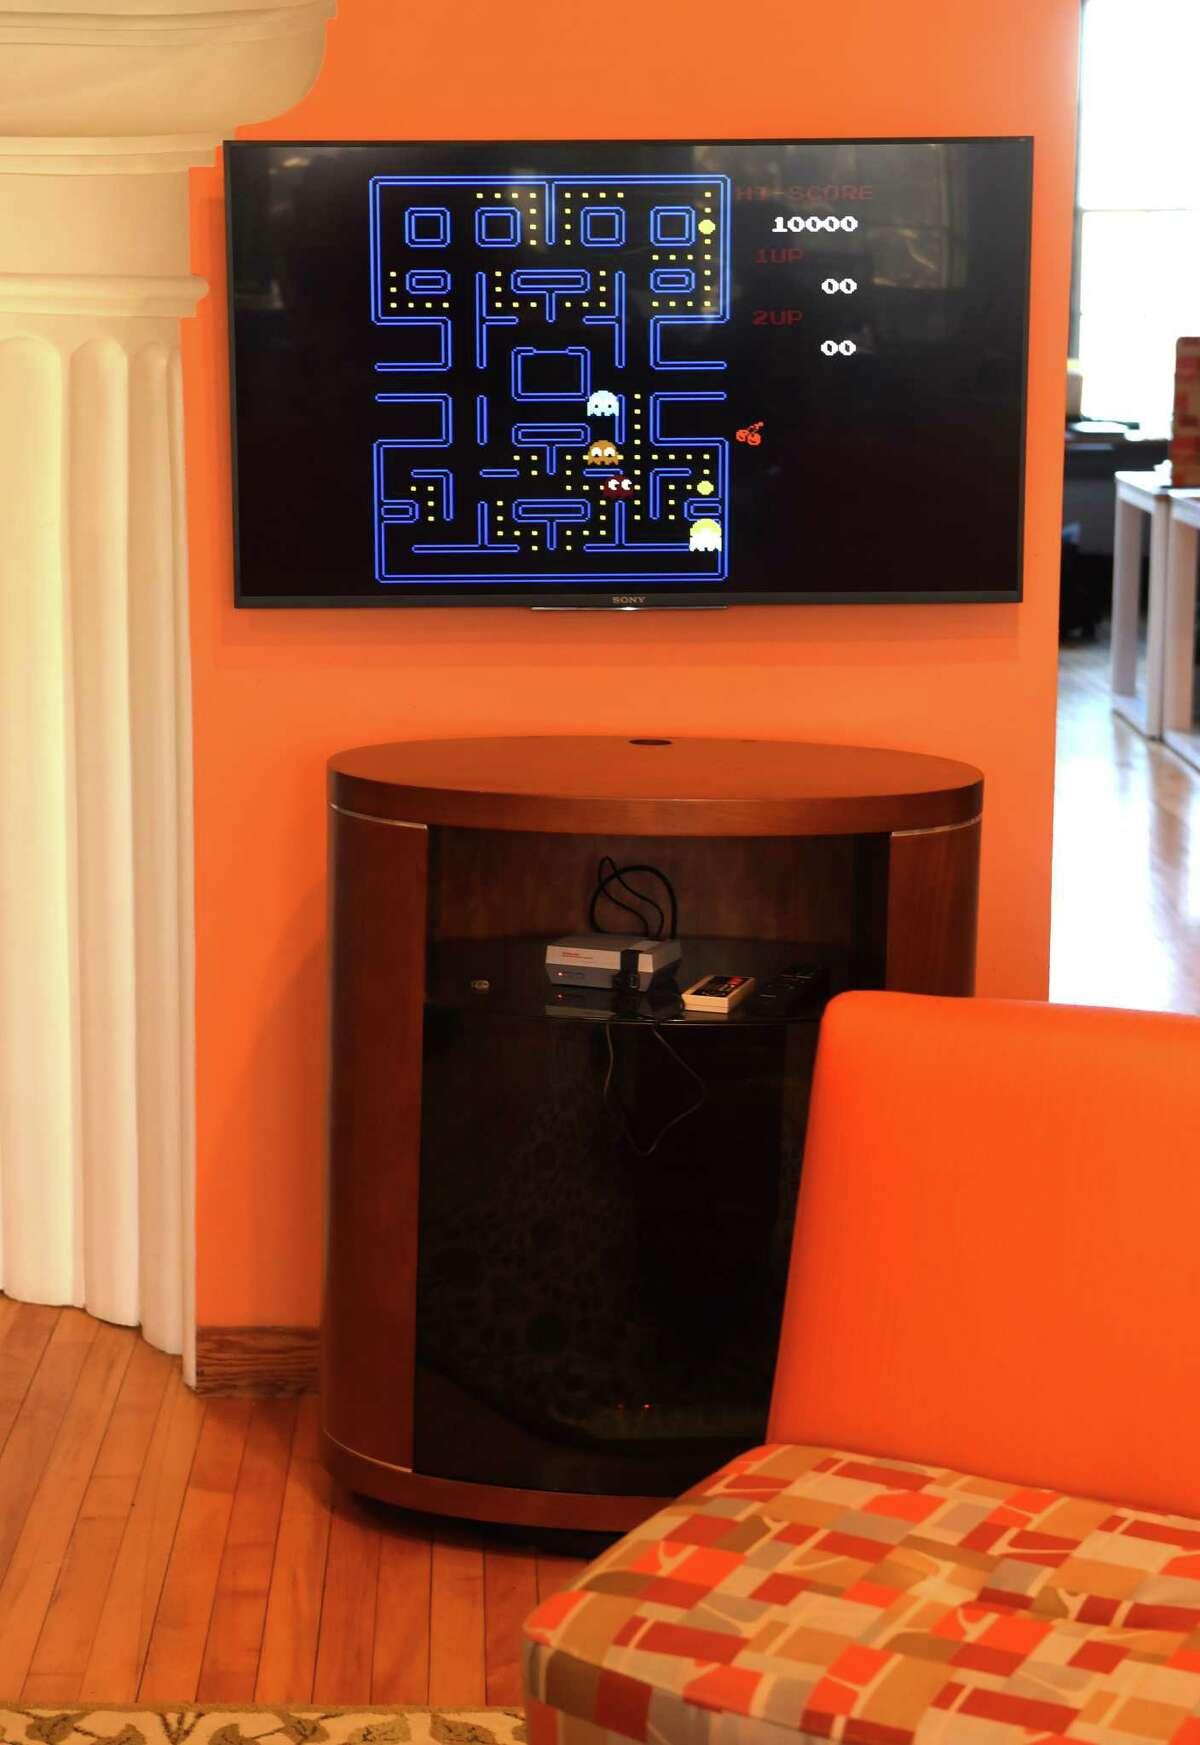 A monitor shows various video games in the lobby at Velan Ventures on Friday, Nov. 18, 2016 in Troy, N.Y. (Lori Van Buren / Times Union)